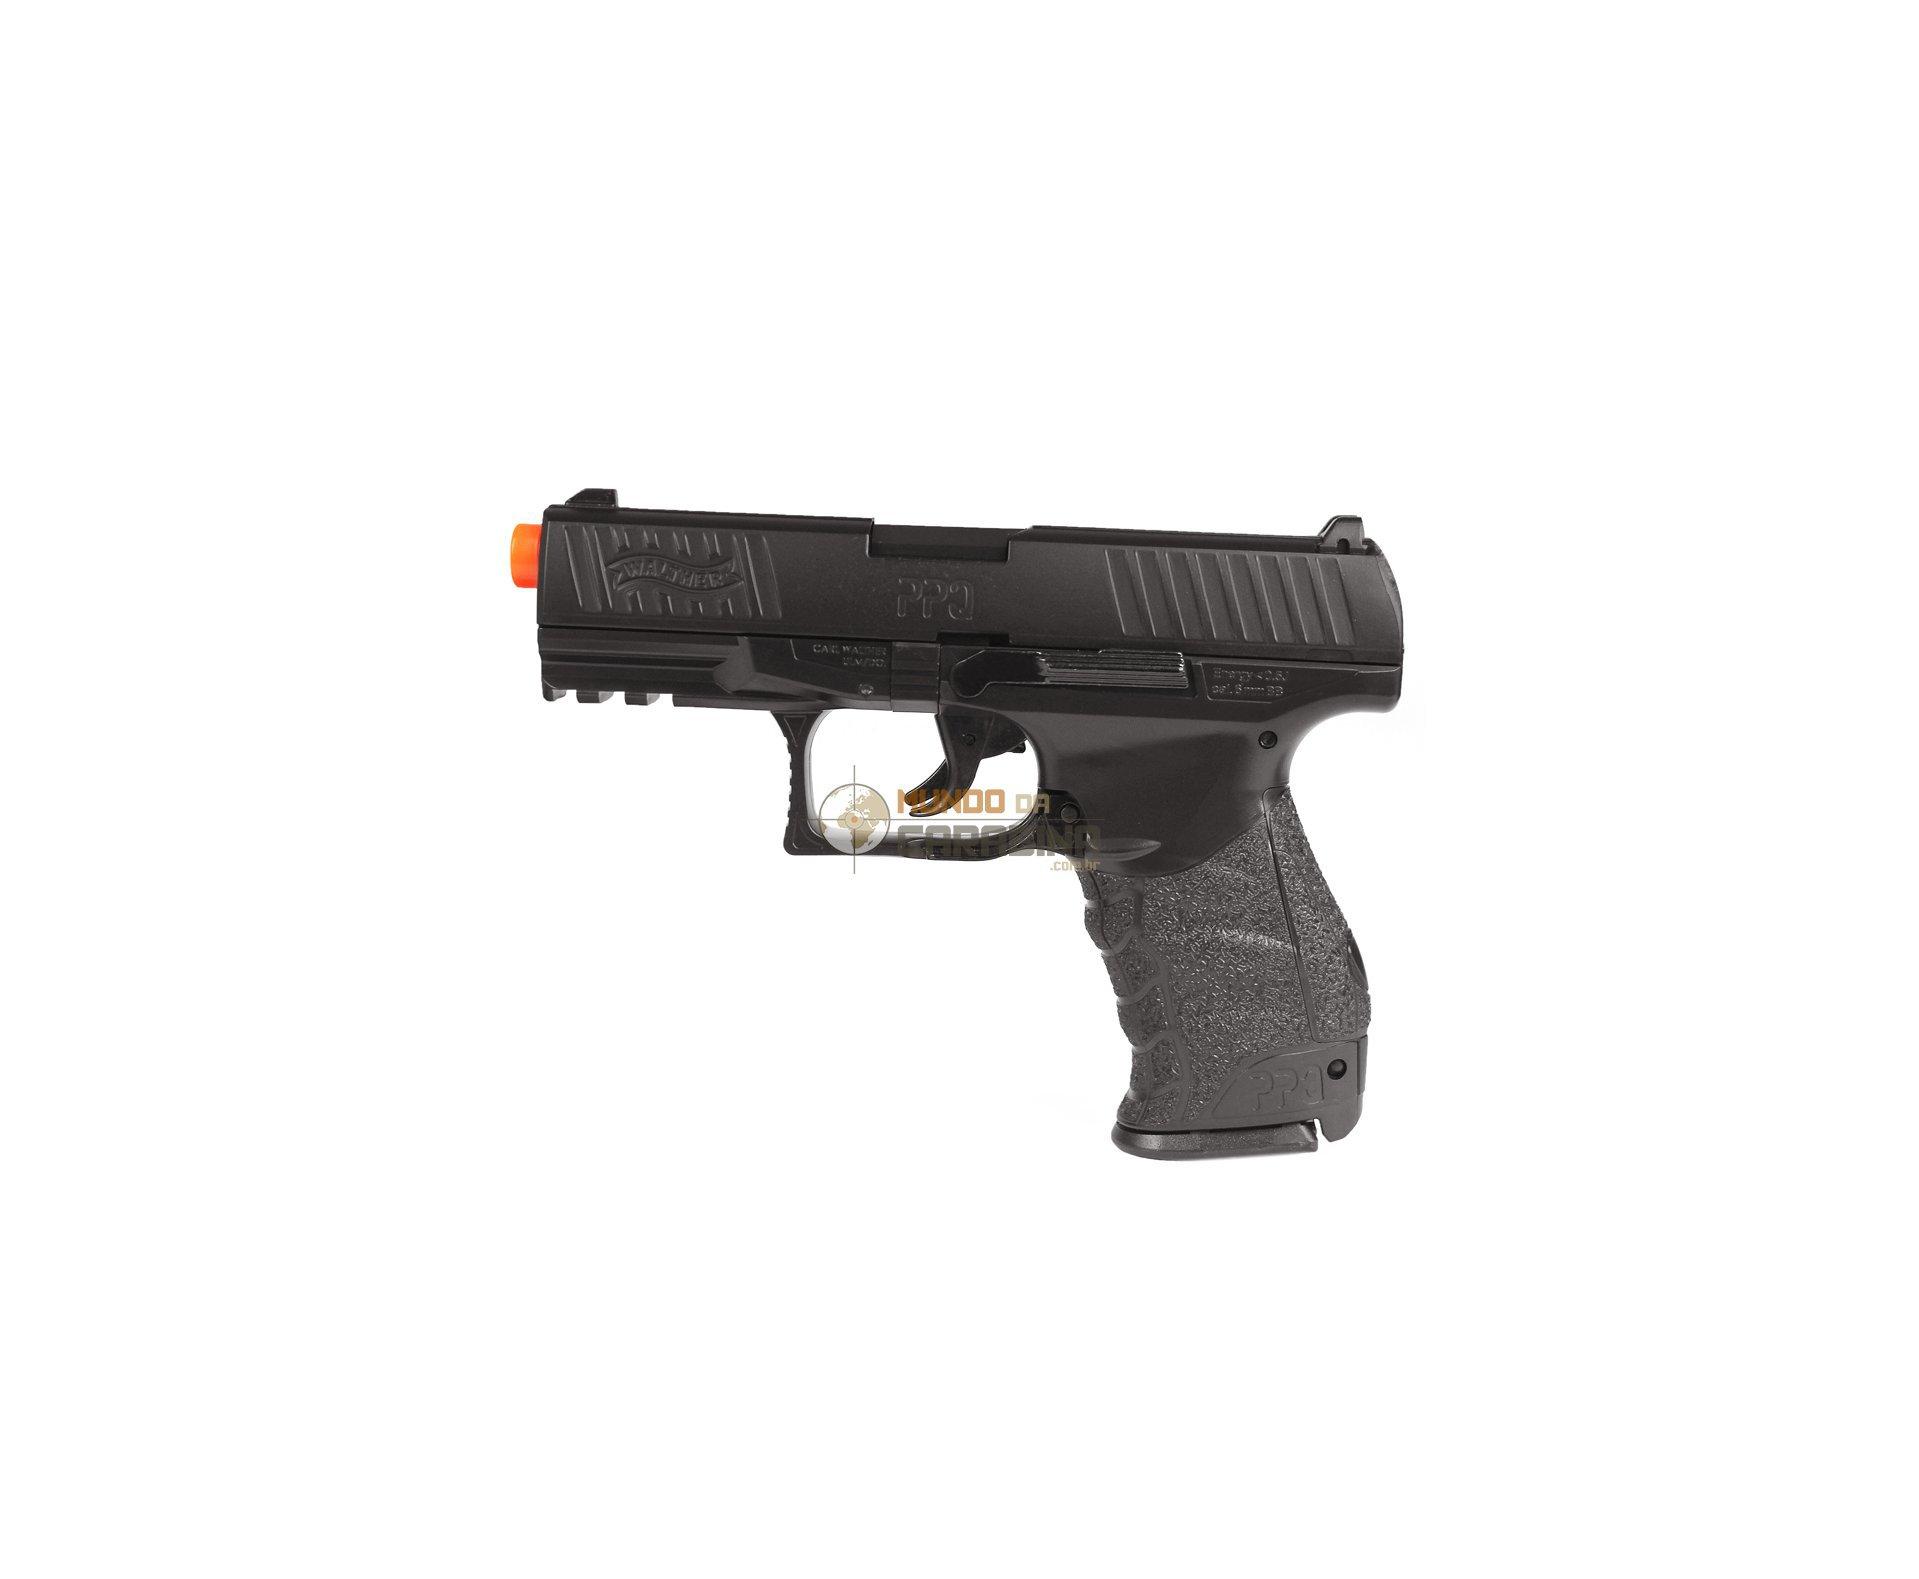 Pistola De Airsoft Walther Ppq Slide Metal - Cal 6mm + 4000 Esferas 0,12g + Case Deluxe